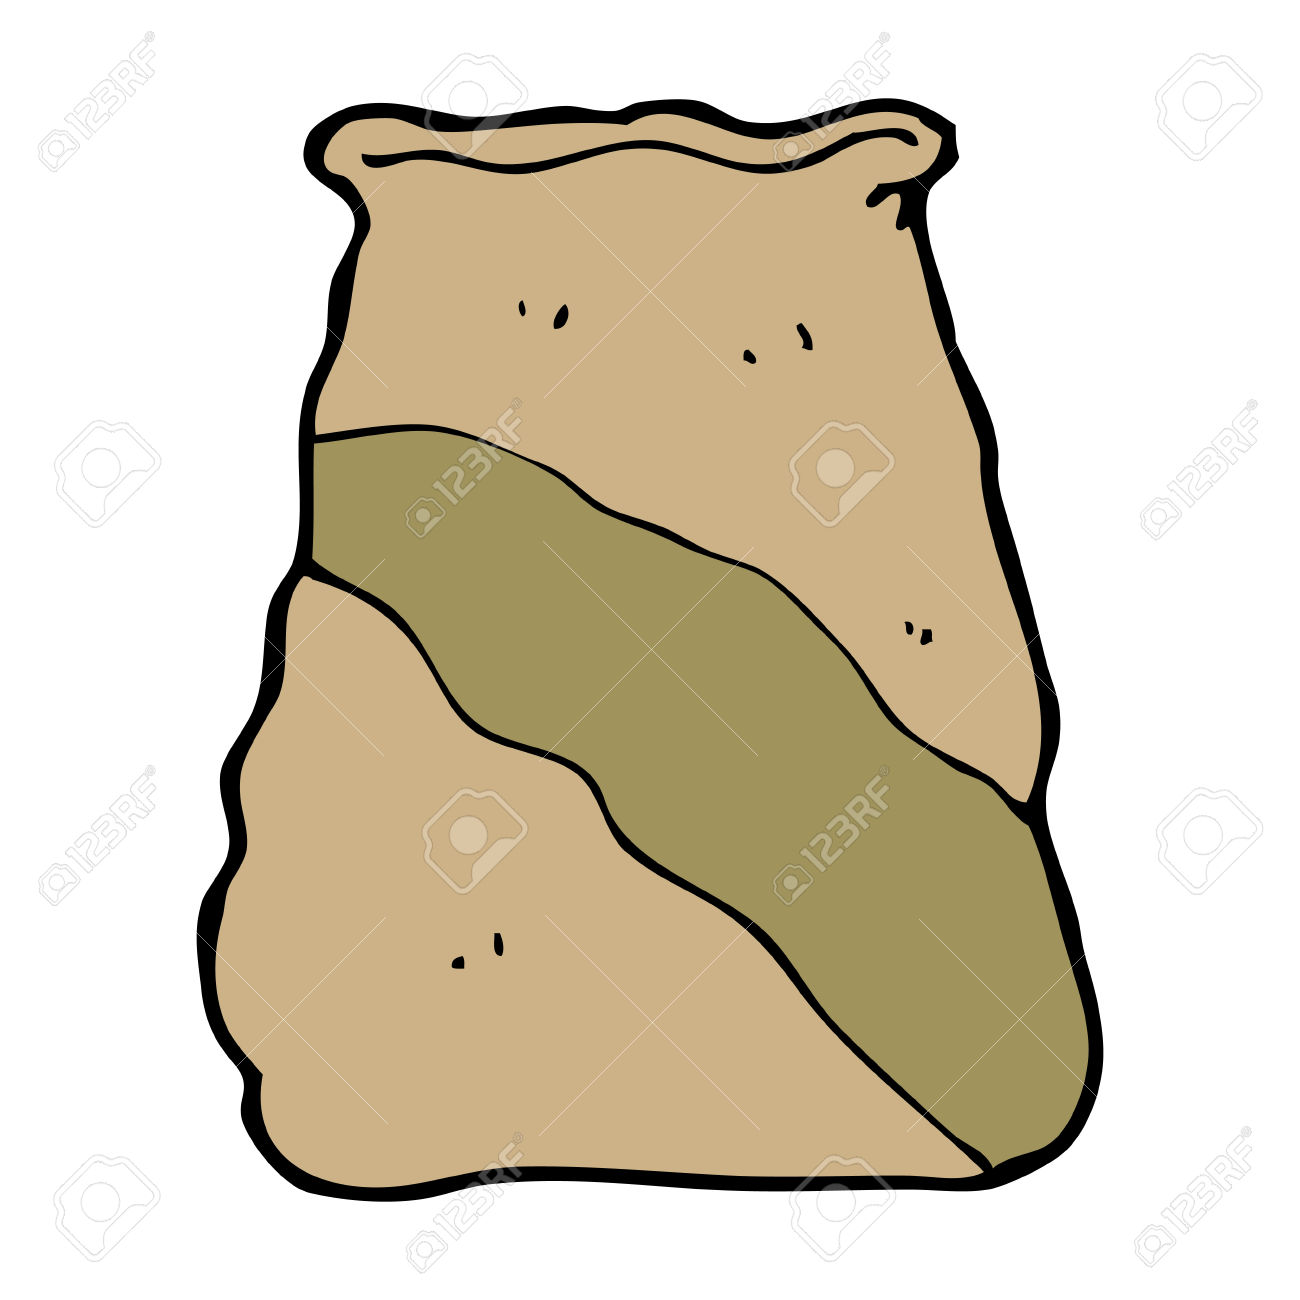 Cartoon Sack Of Potatoes Royalty Free Cliparts, Vectors, And Stock.